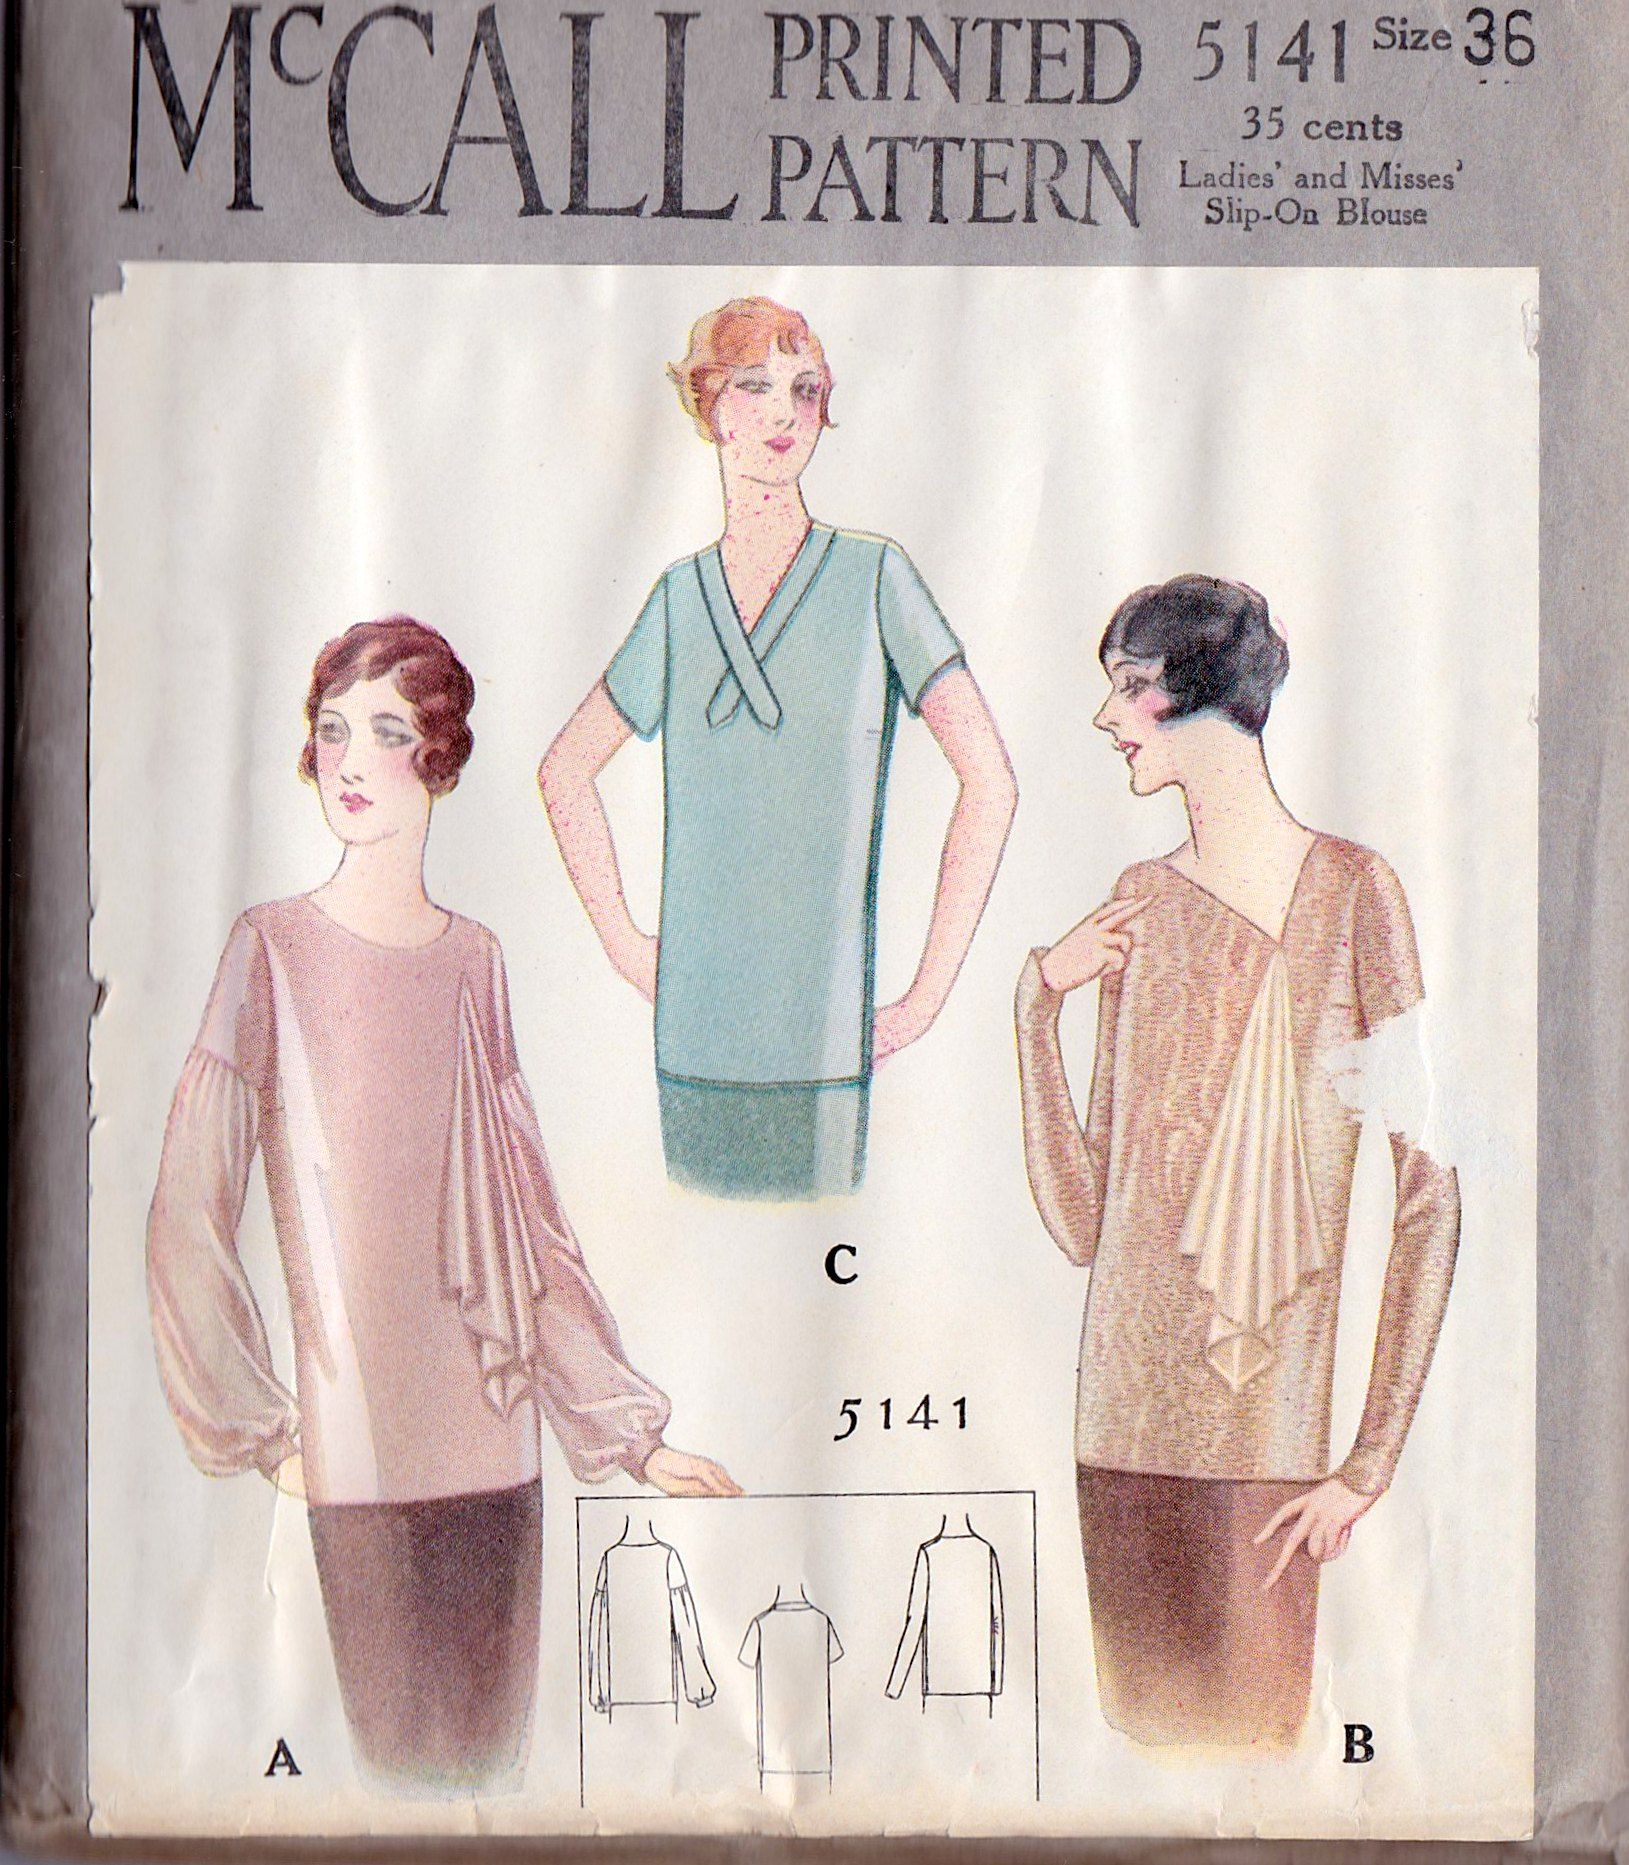 McCall 5141